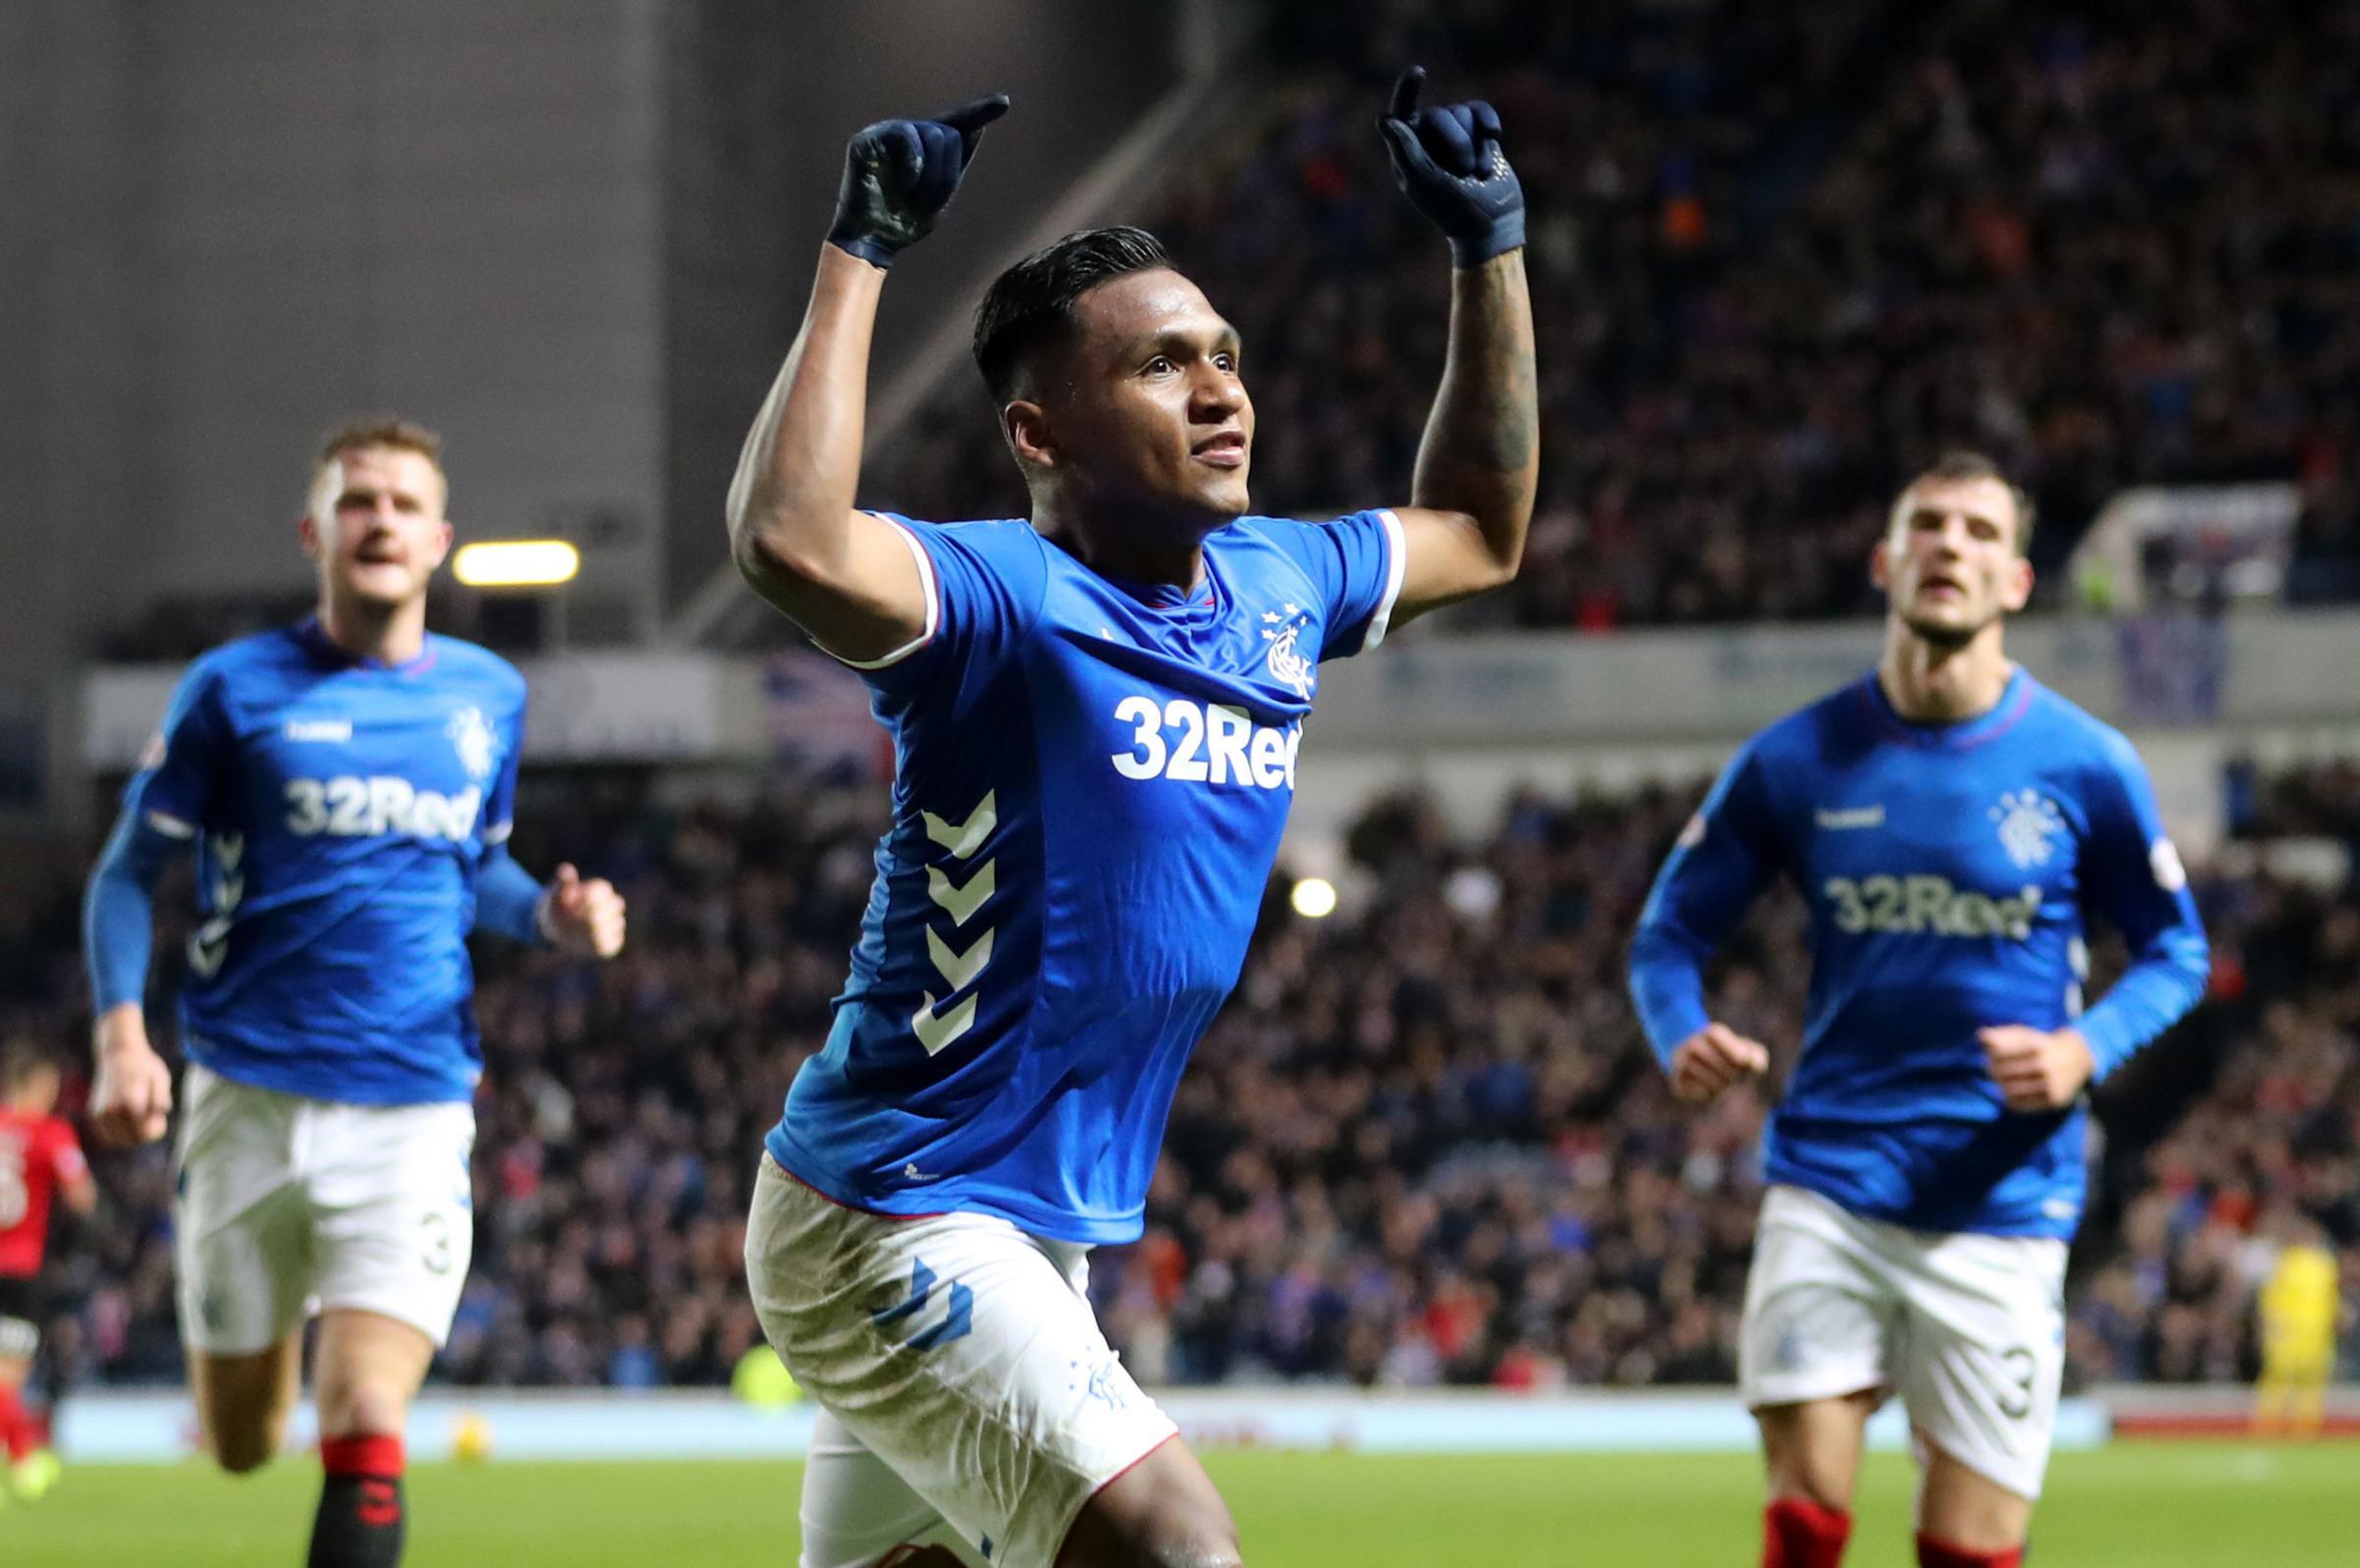 Rangers 5 Kilmarnock 0: Four-goal Alfredo Morelos blasts Rangers into the last eight after early Kilmarnock penalty controversy